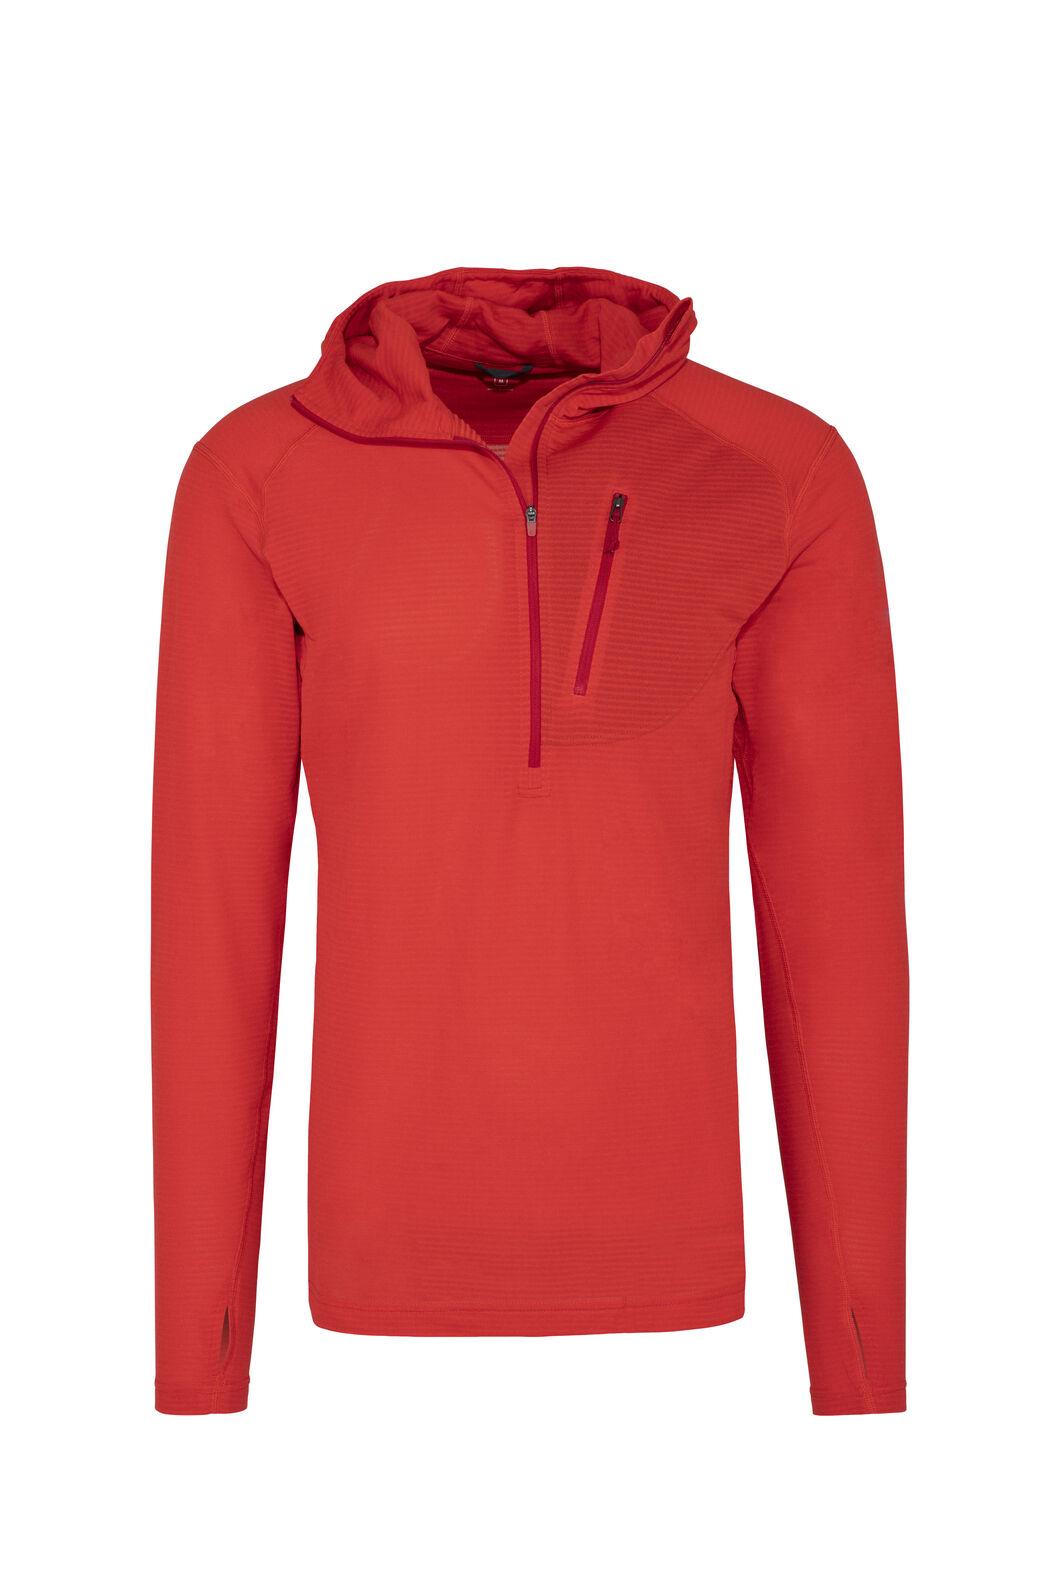 Macpac Men's Prothermal Polartec® Hooded Pullover, Flame Scarlet, hi-res